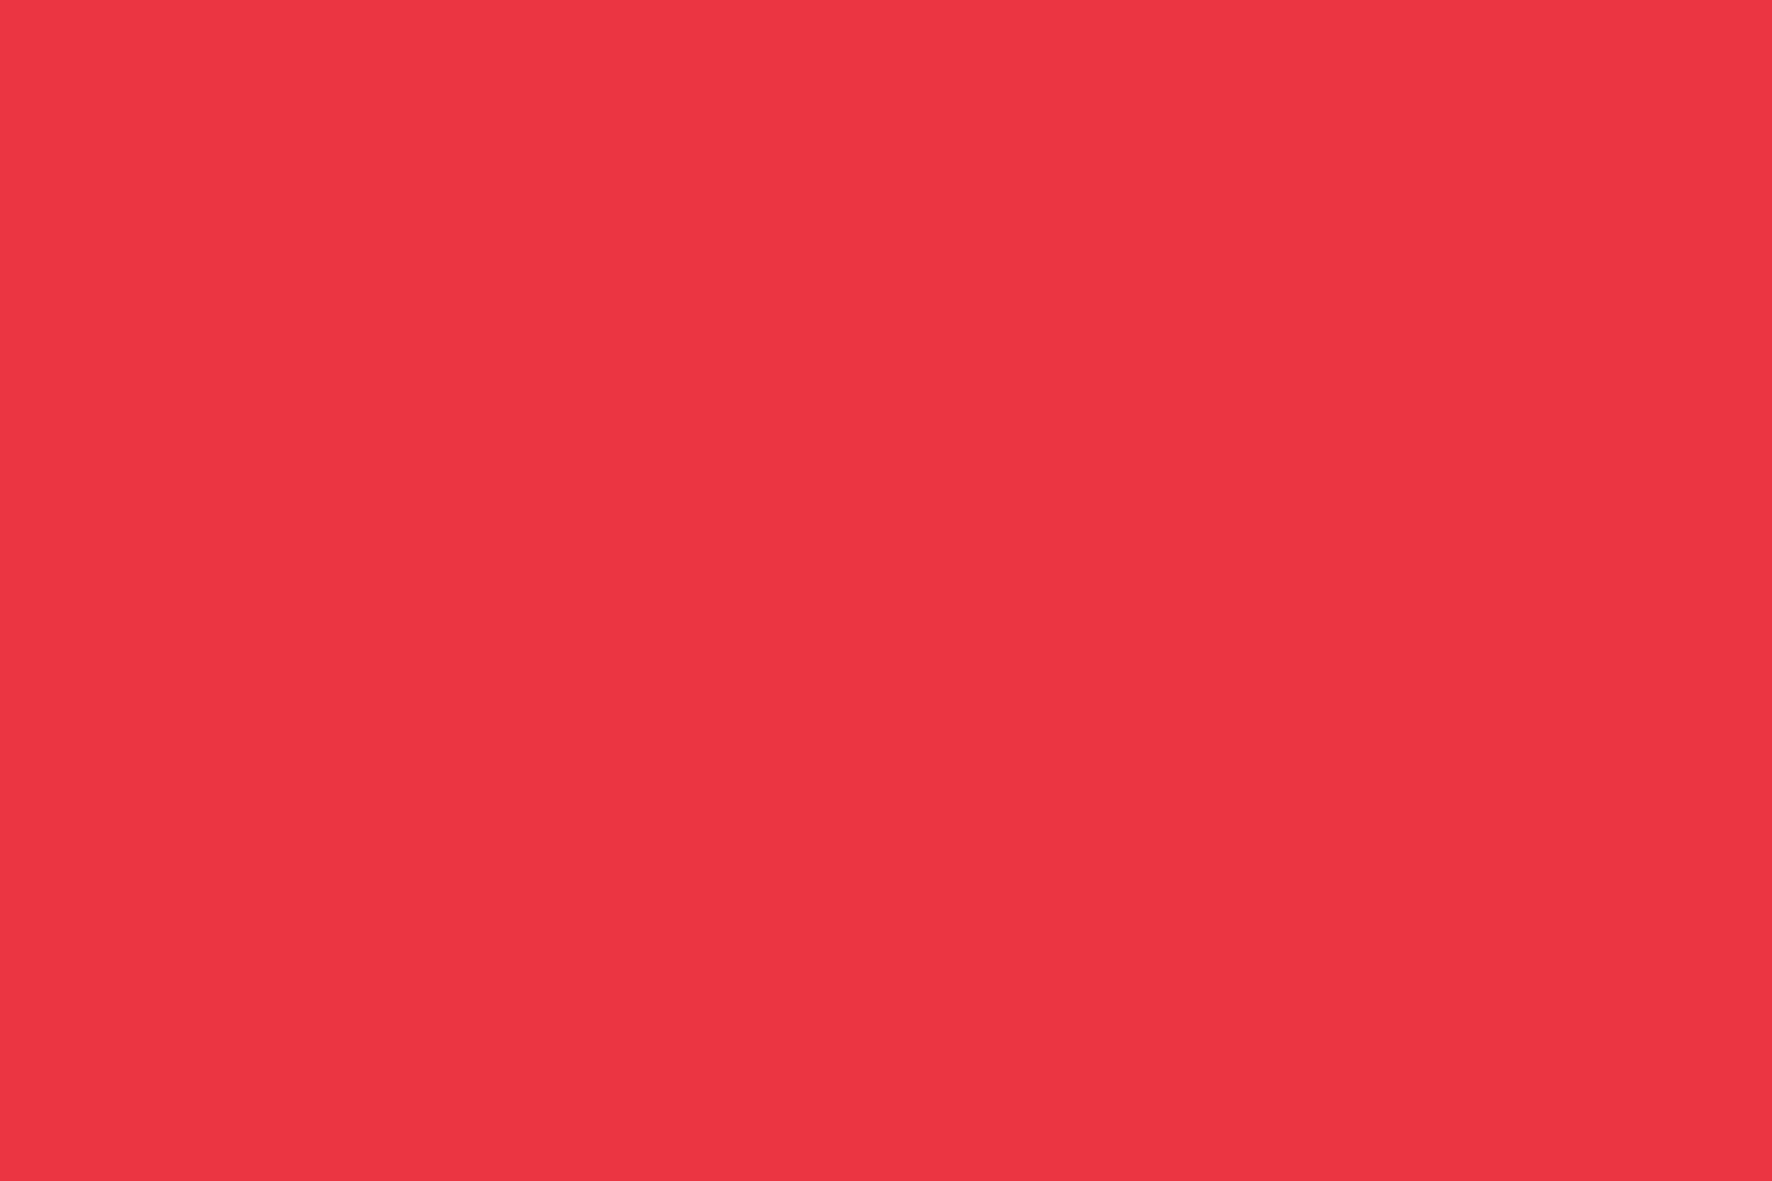 vermelho.jpg